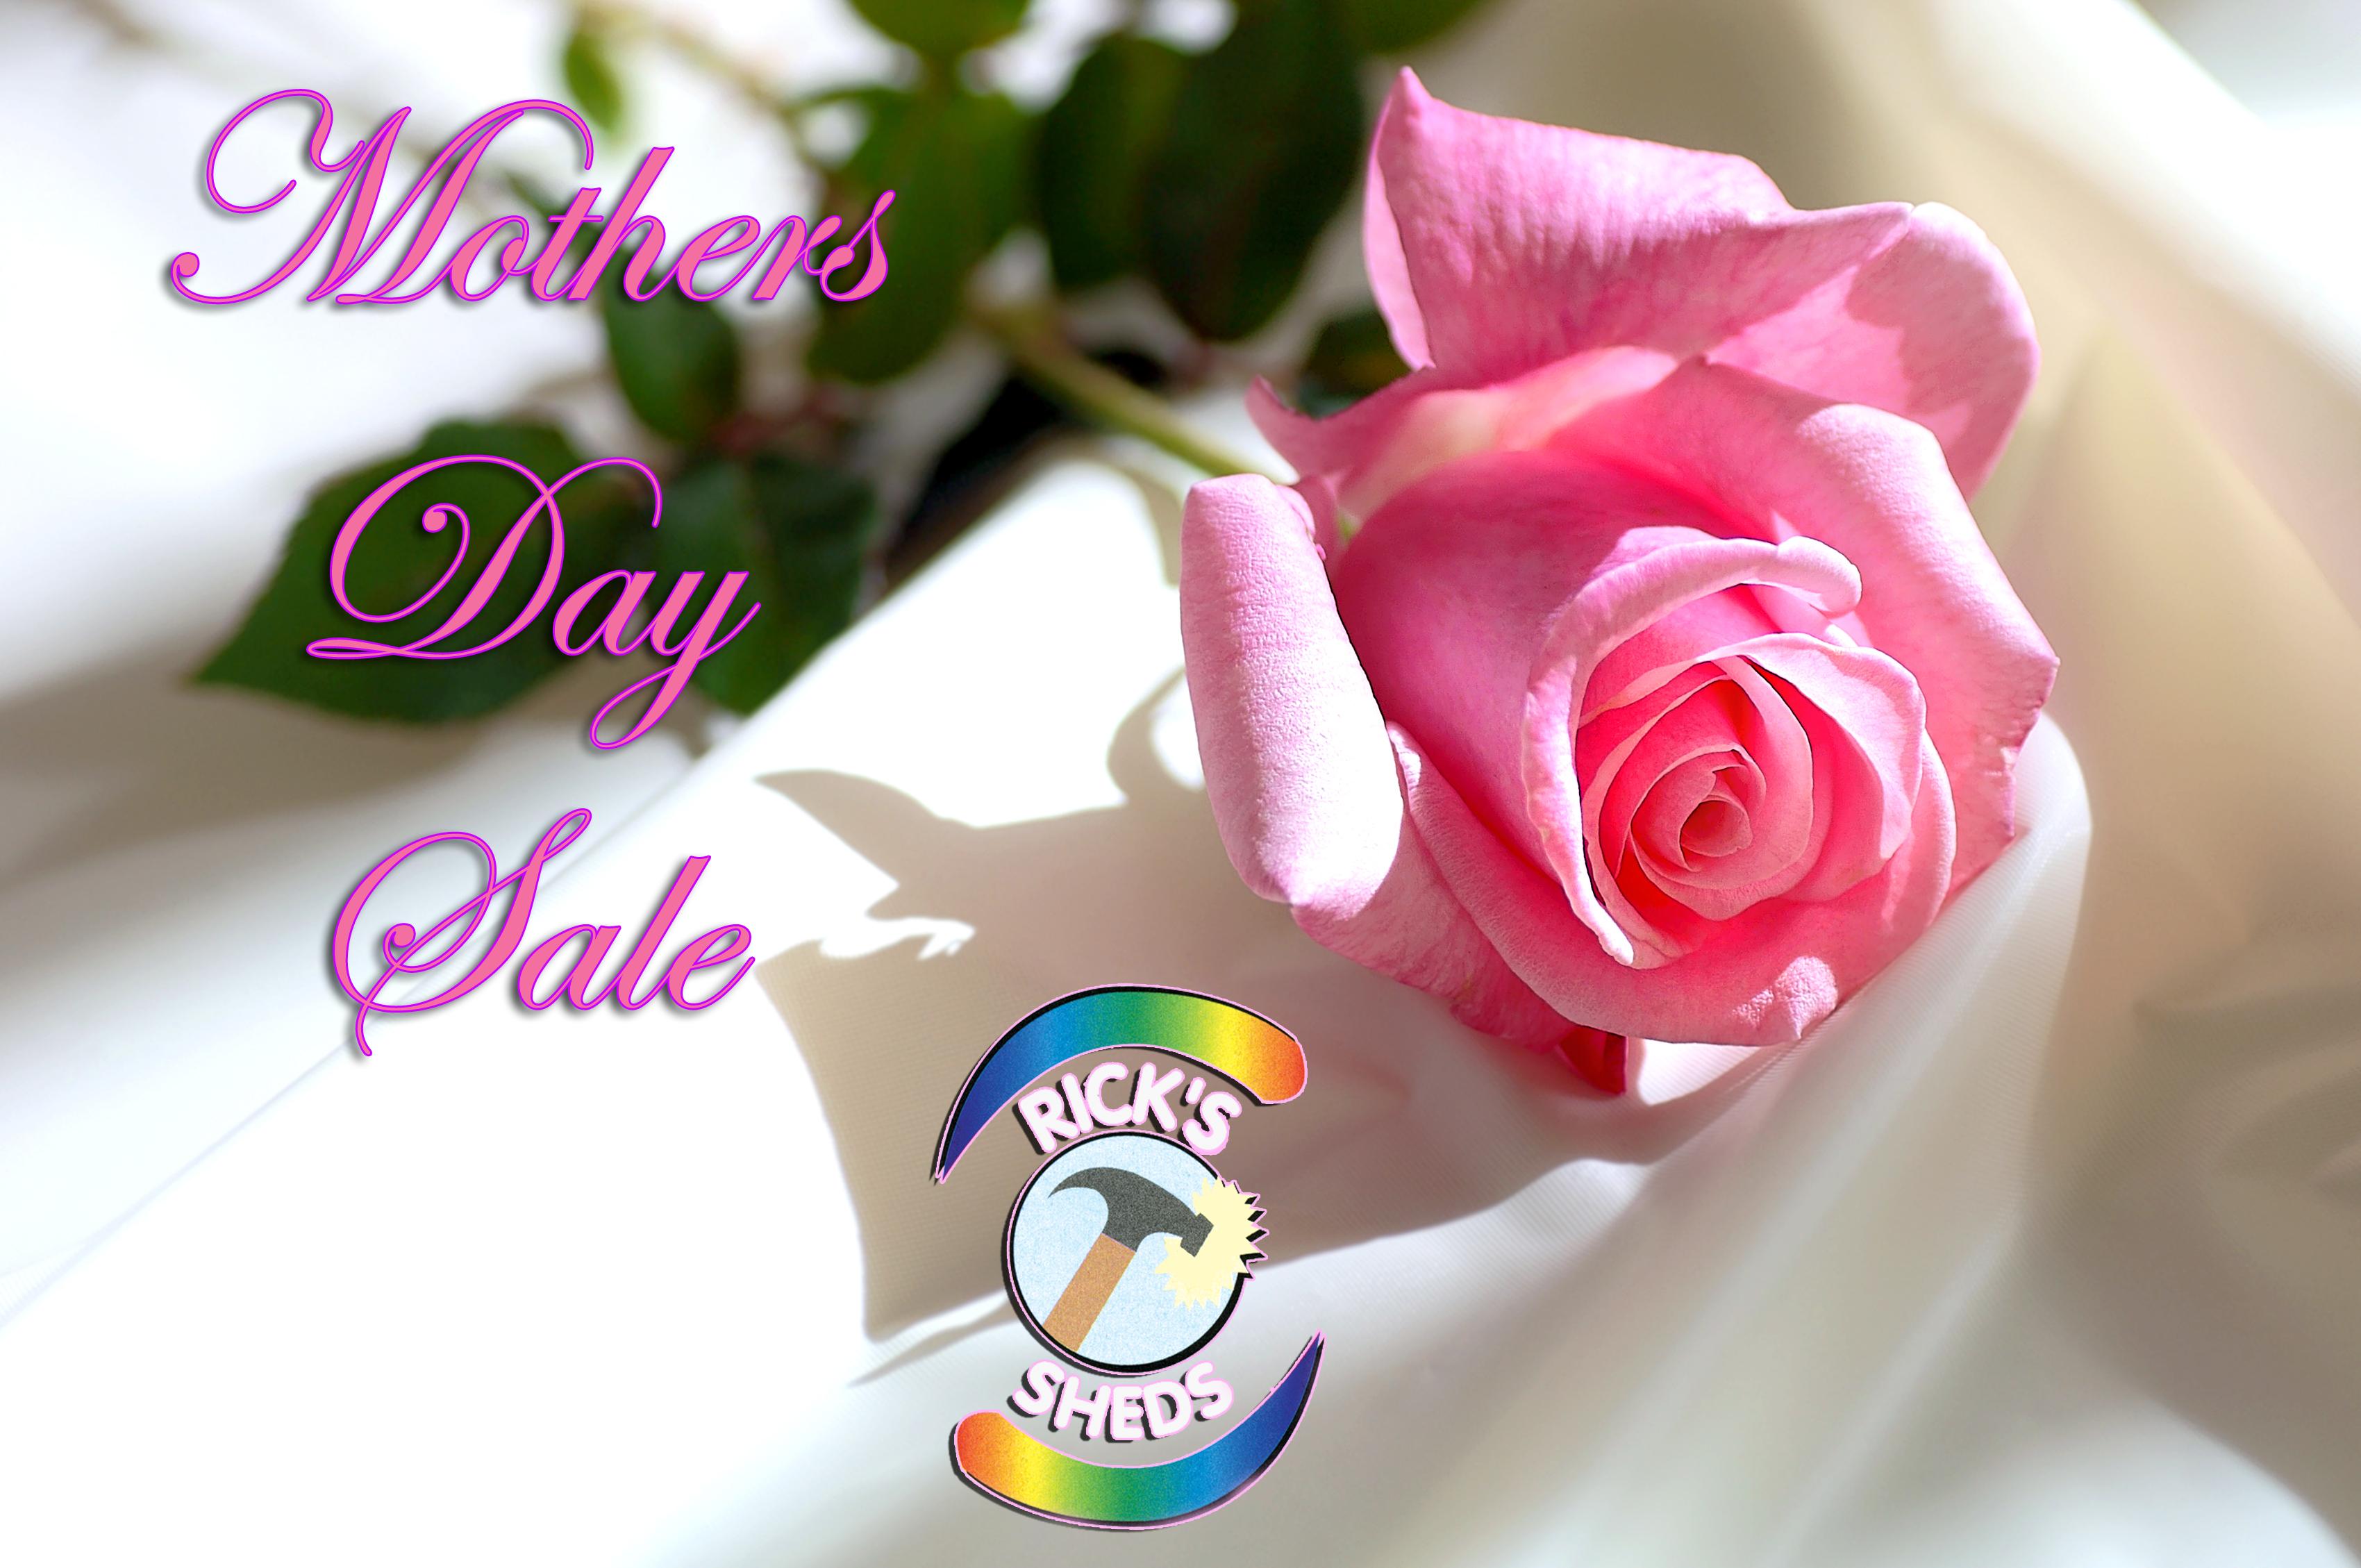 mothers day sale ricks sheds copy.png